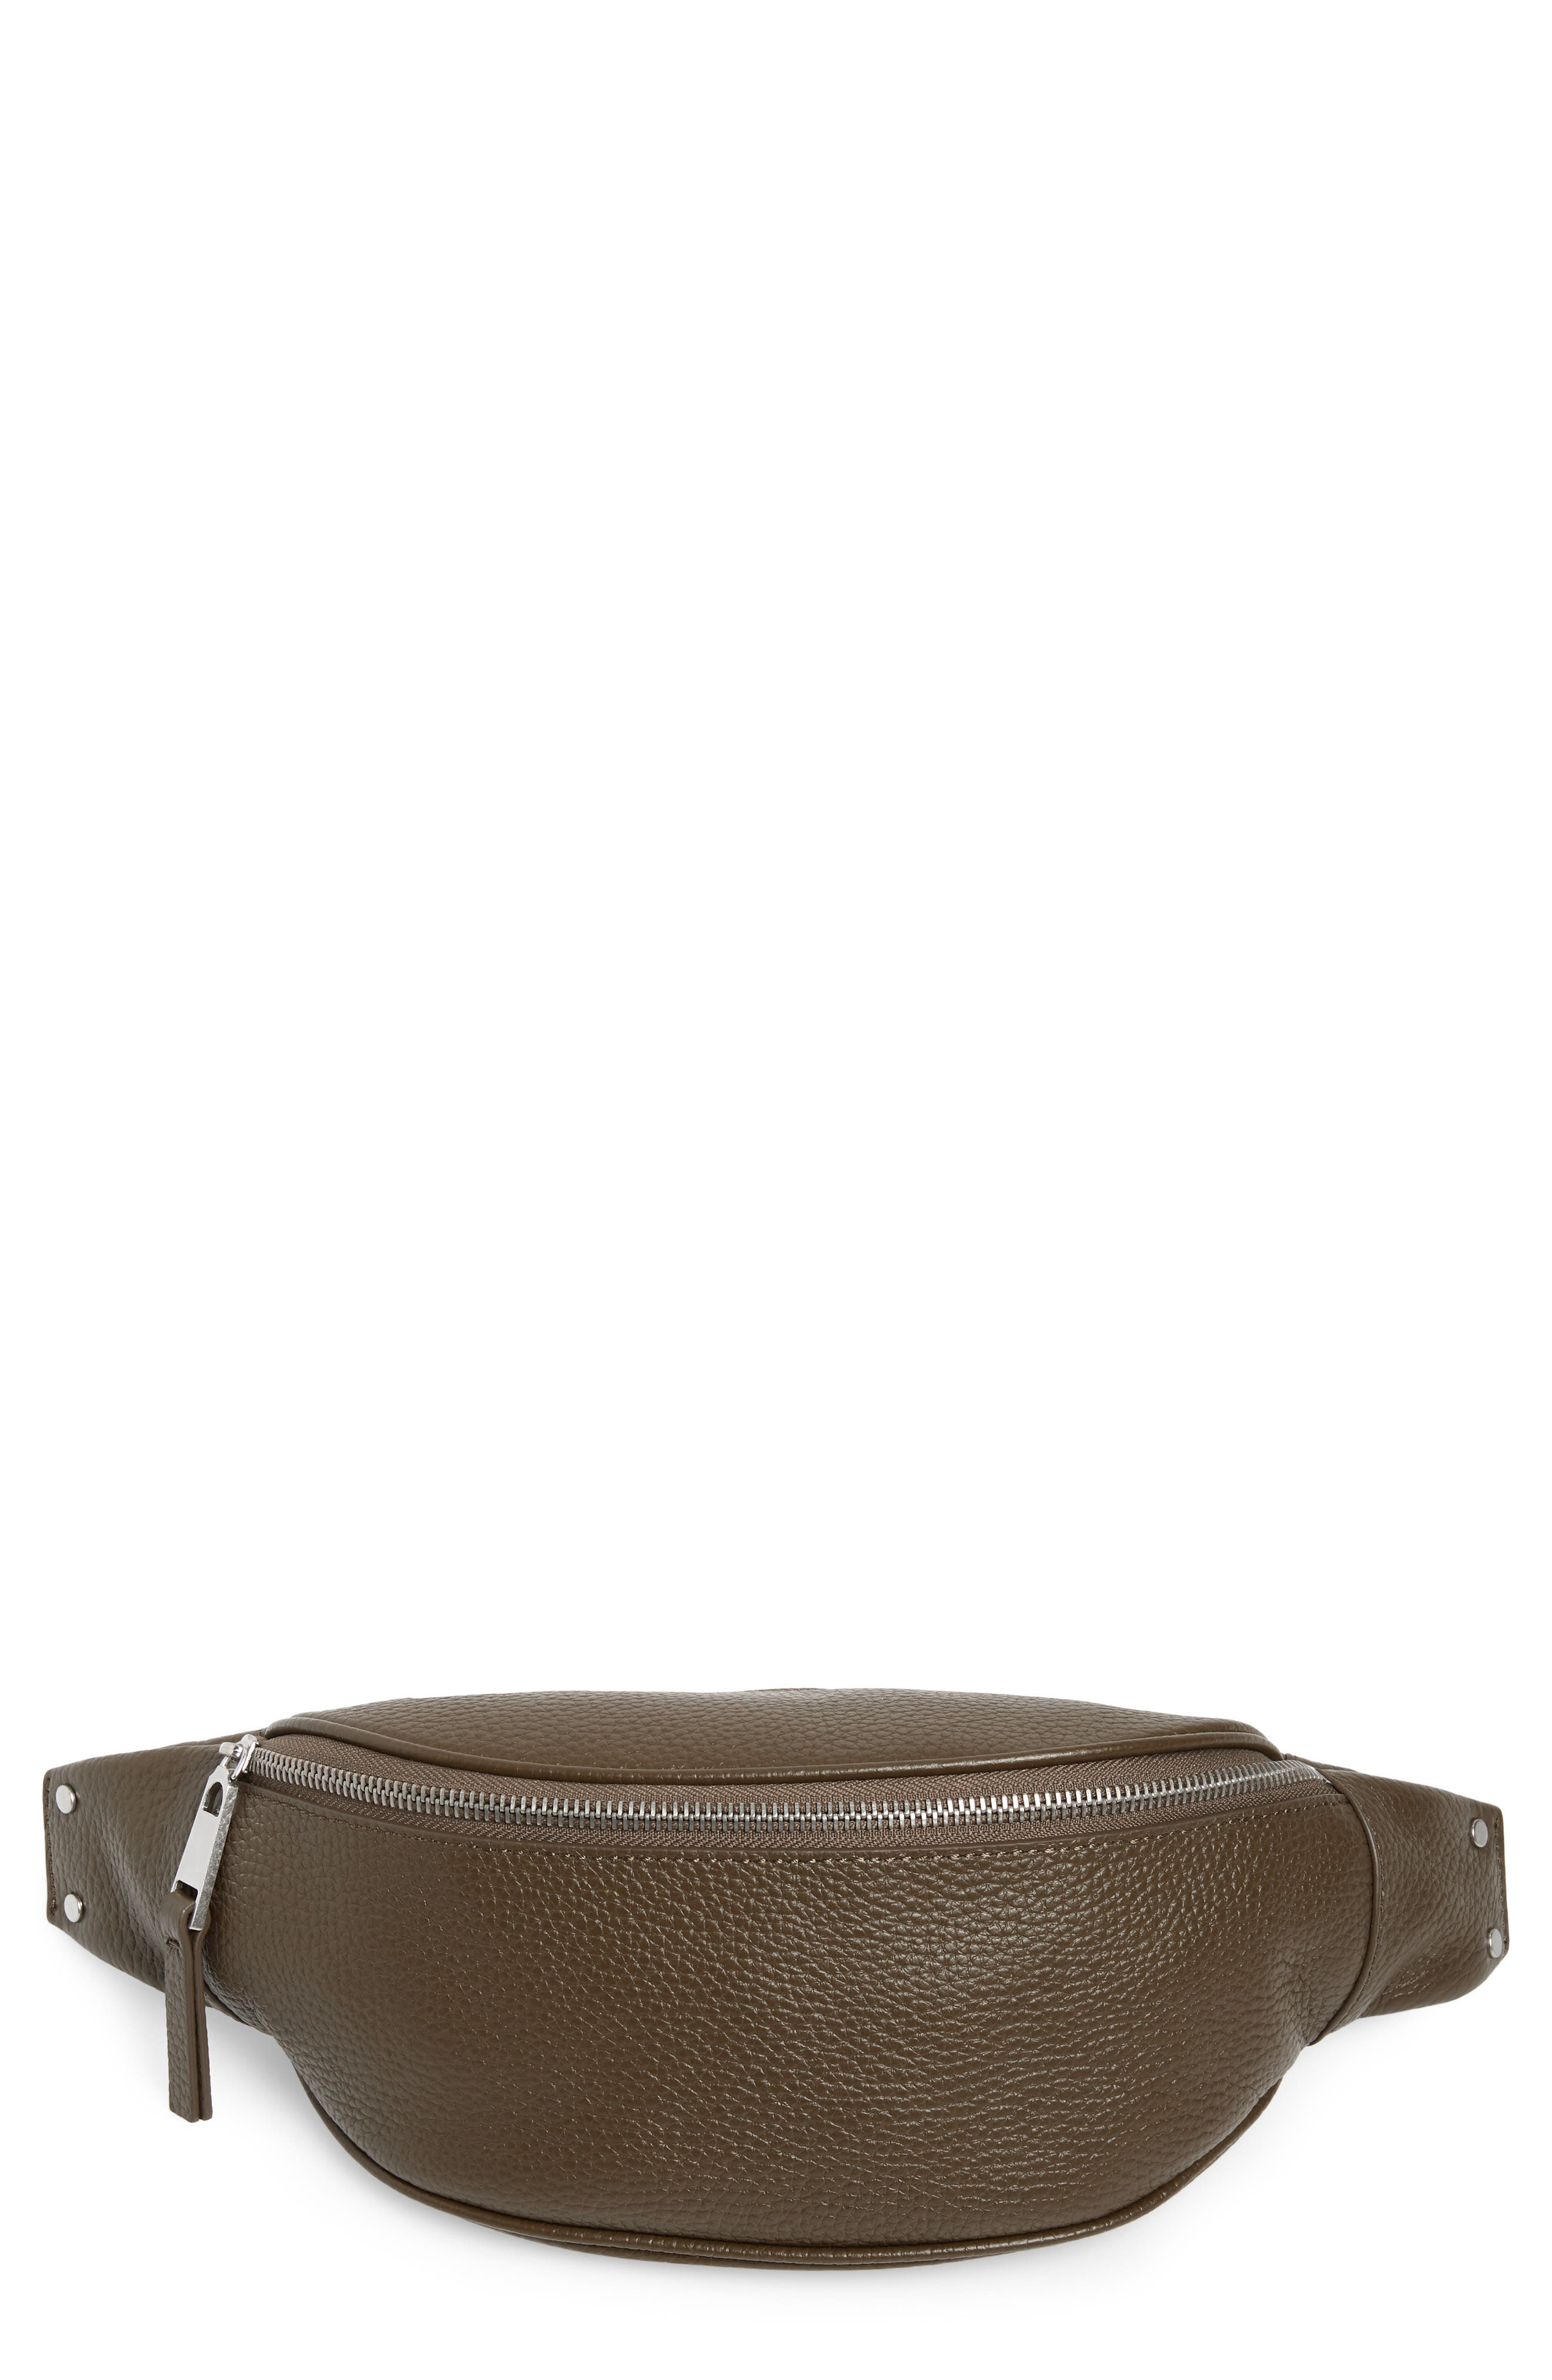 Mason Pebbled Leather Belt Bag,                             Main thumbnail 1, color,                             OLIVE GROVE